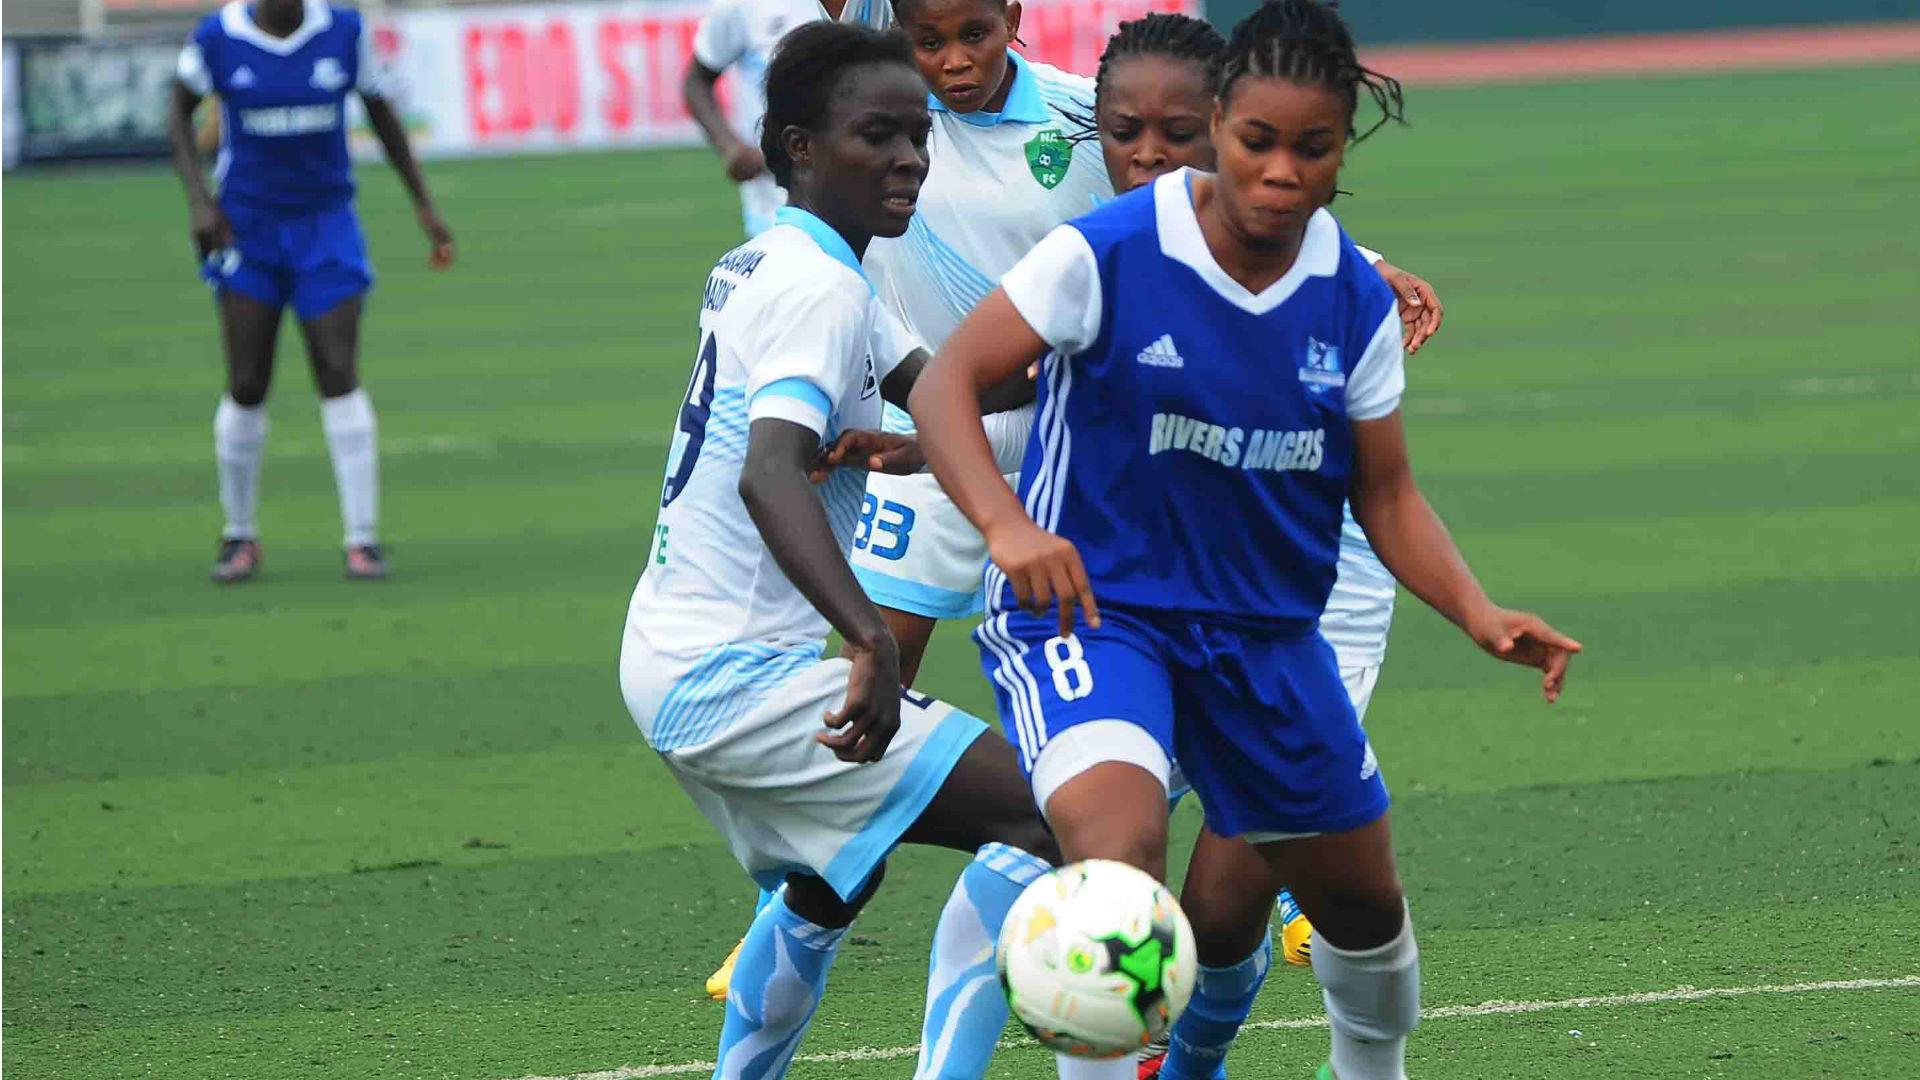 Women's Premier League schedule changed in Nigeria